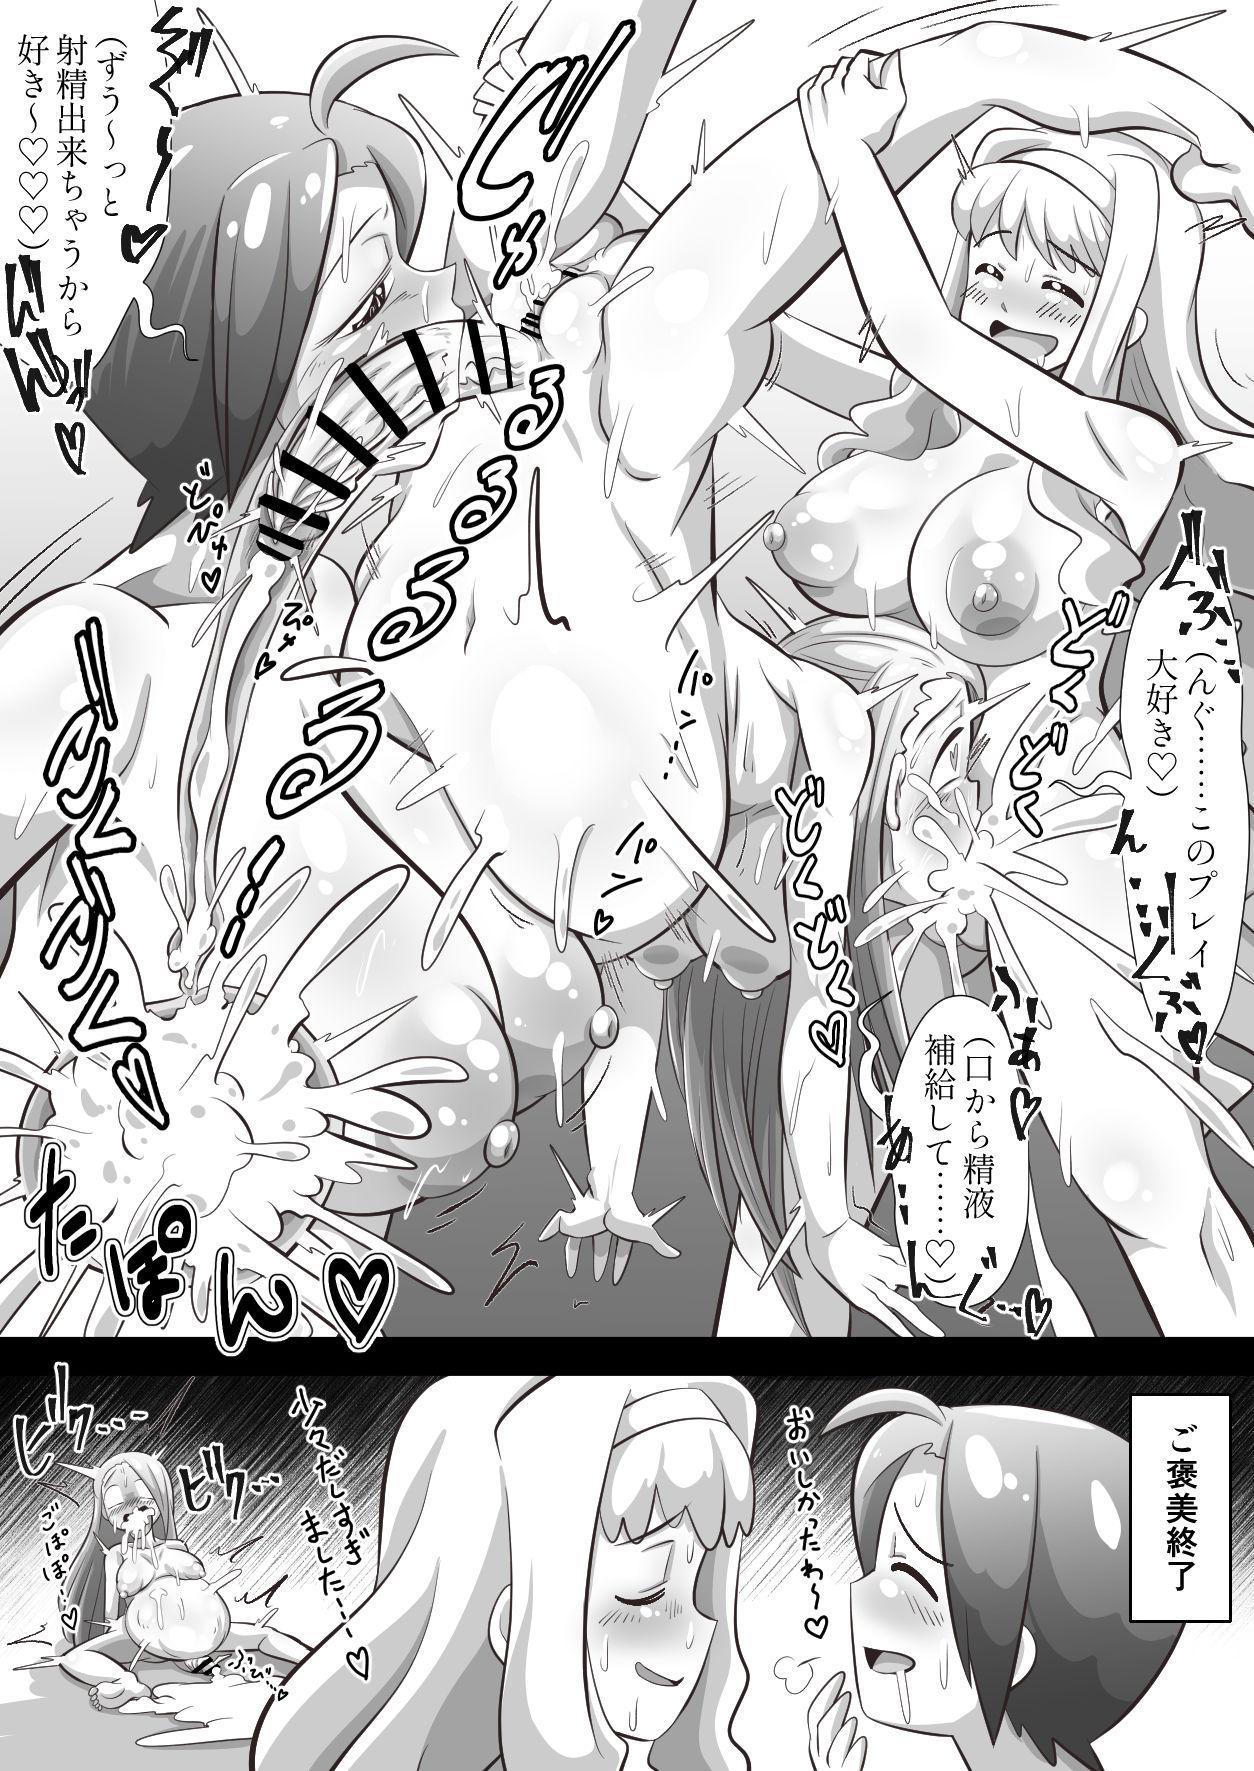 Azusa and Takane's Futanari Iori Training Plan 26